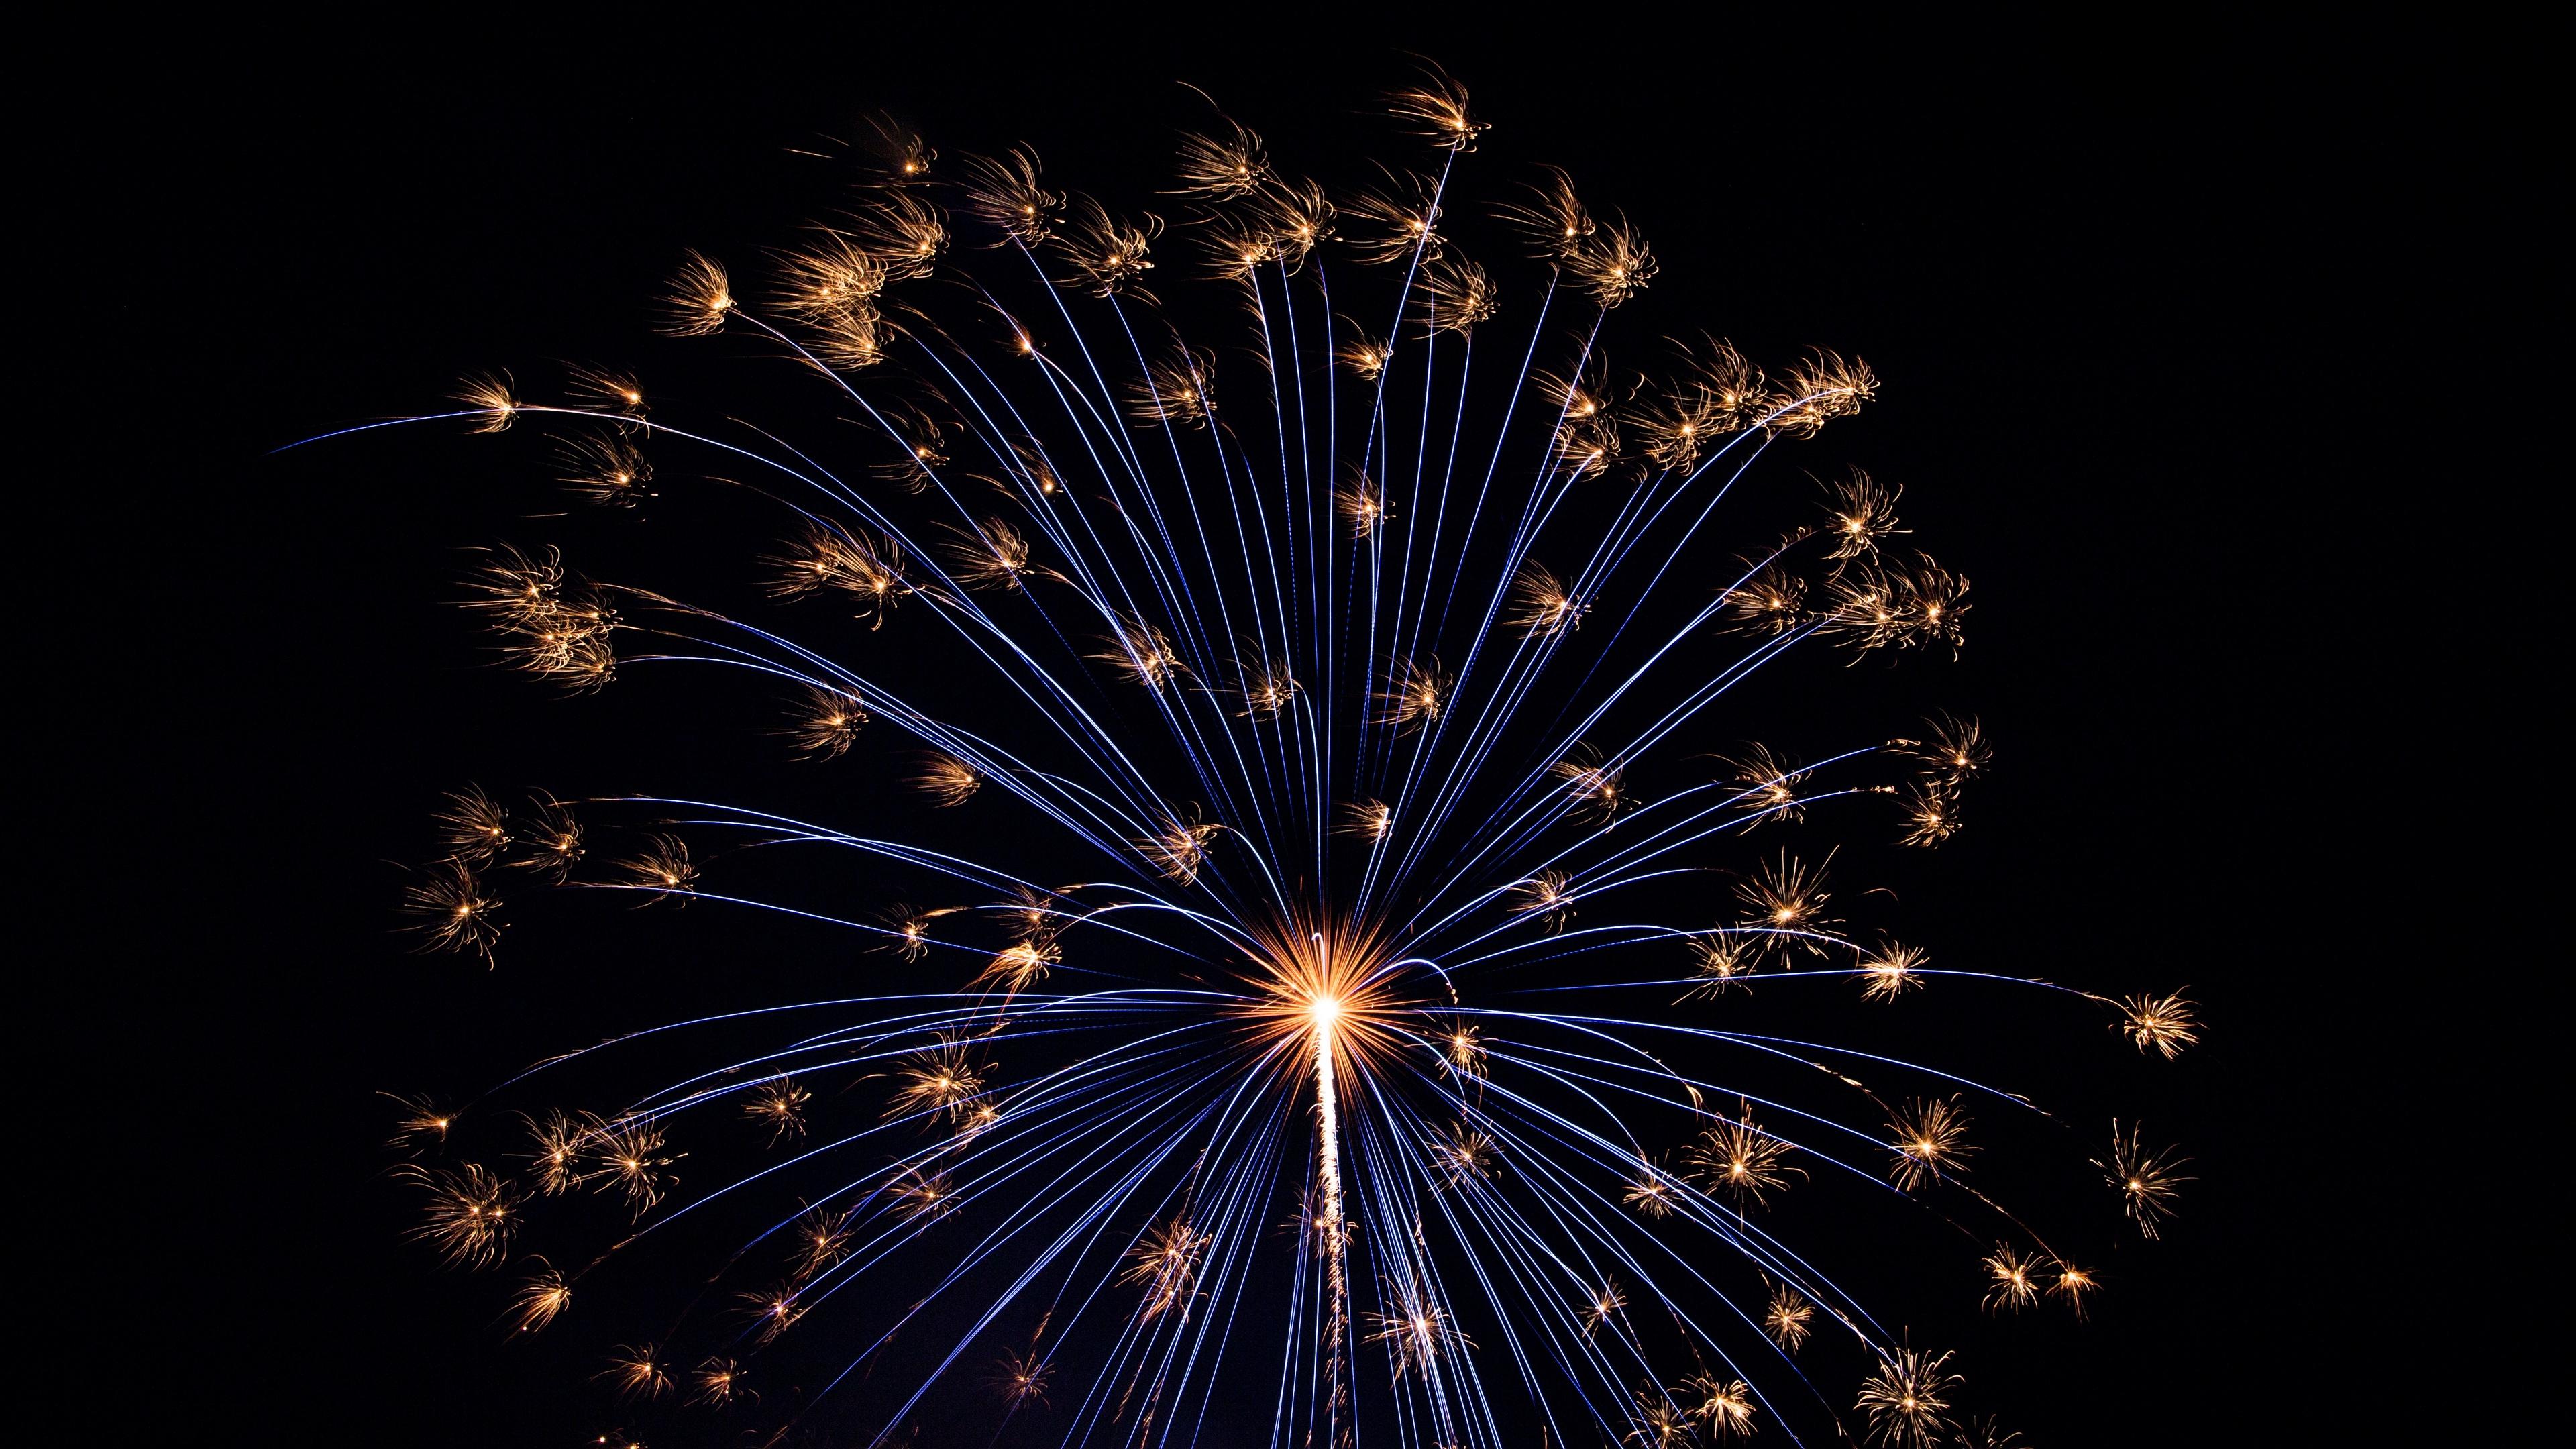 salute fireworks holiday 4k 1538345089 - salute, fireworks, holiday 4k - salute, Holiday, Fireworks